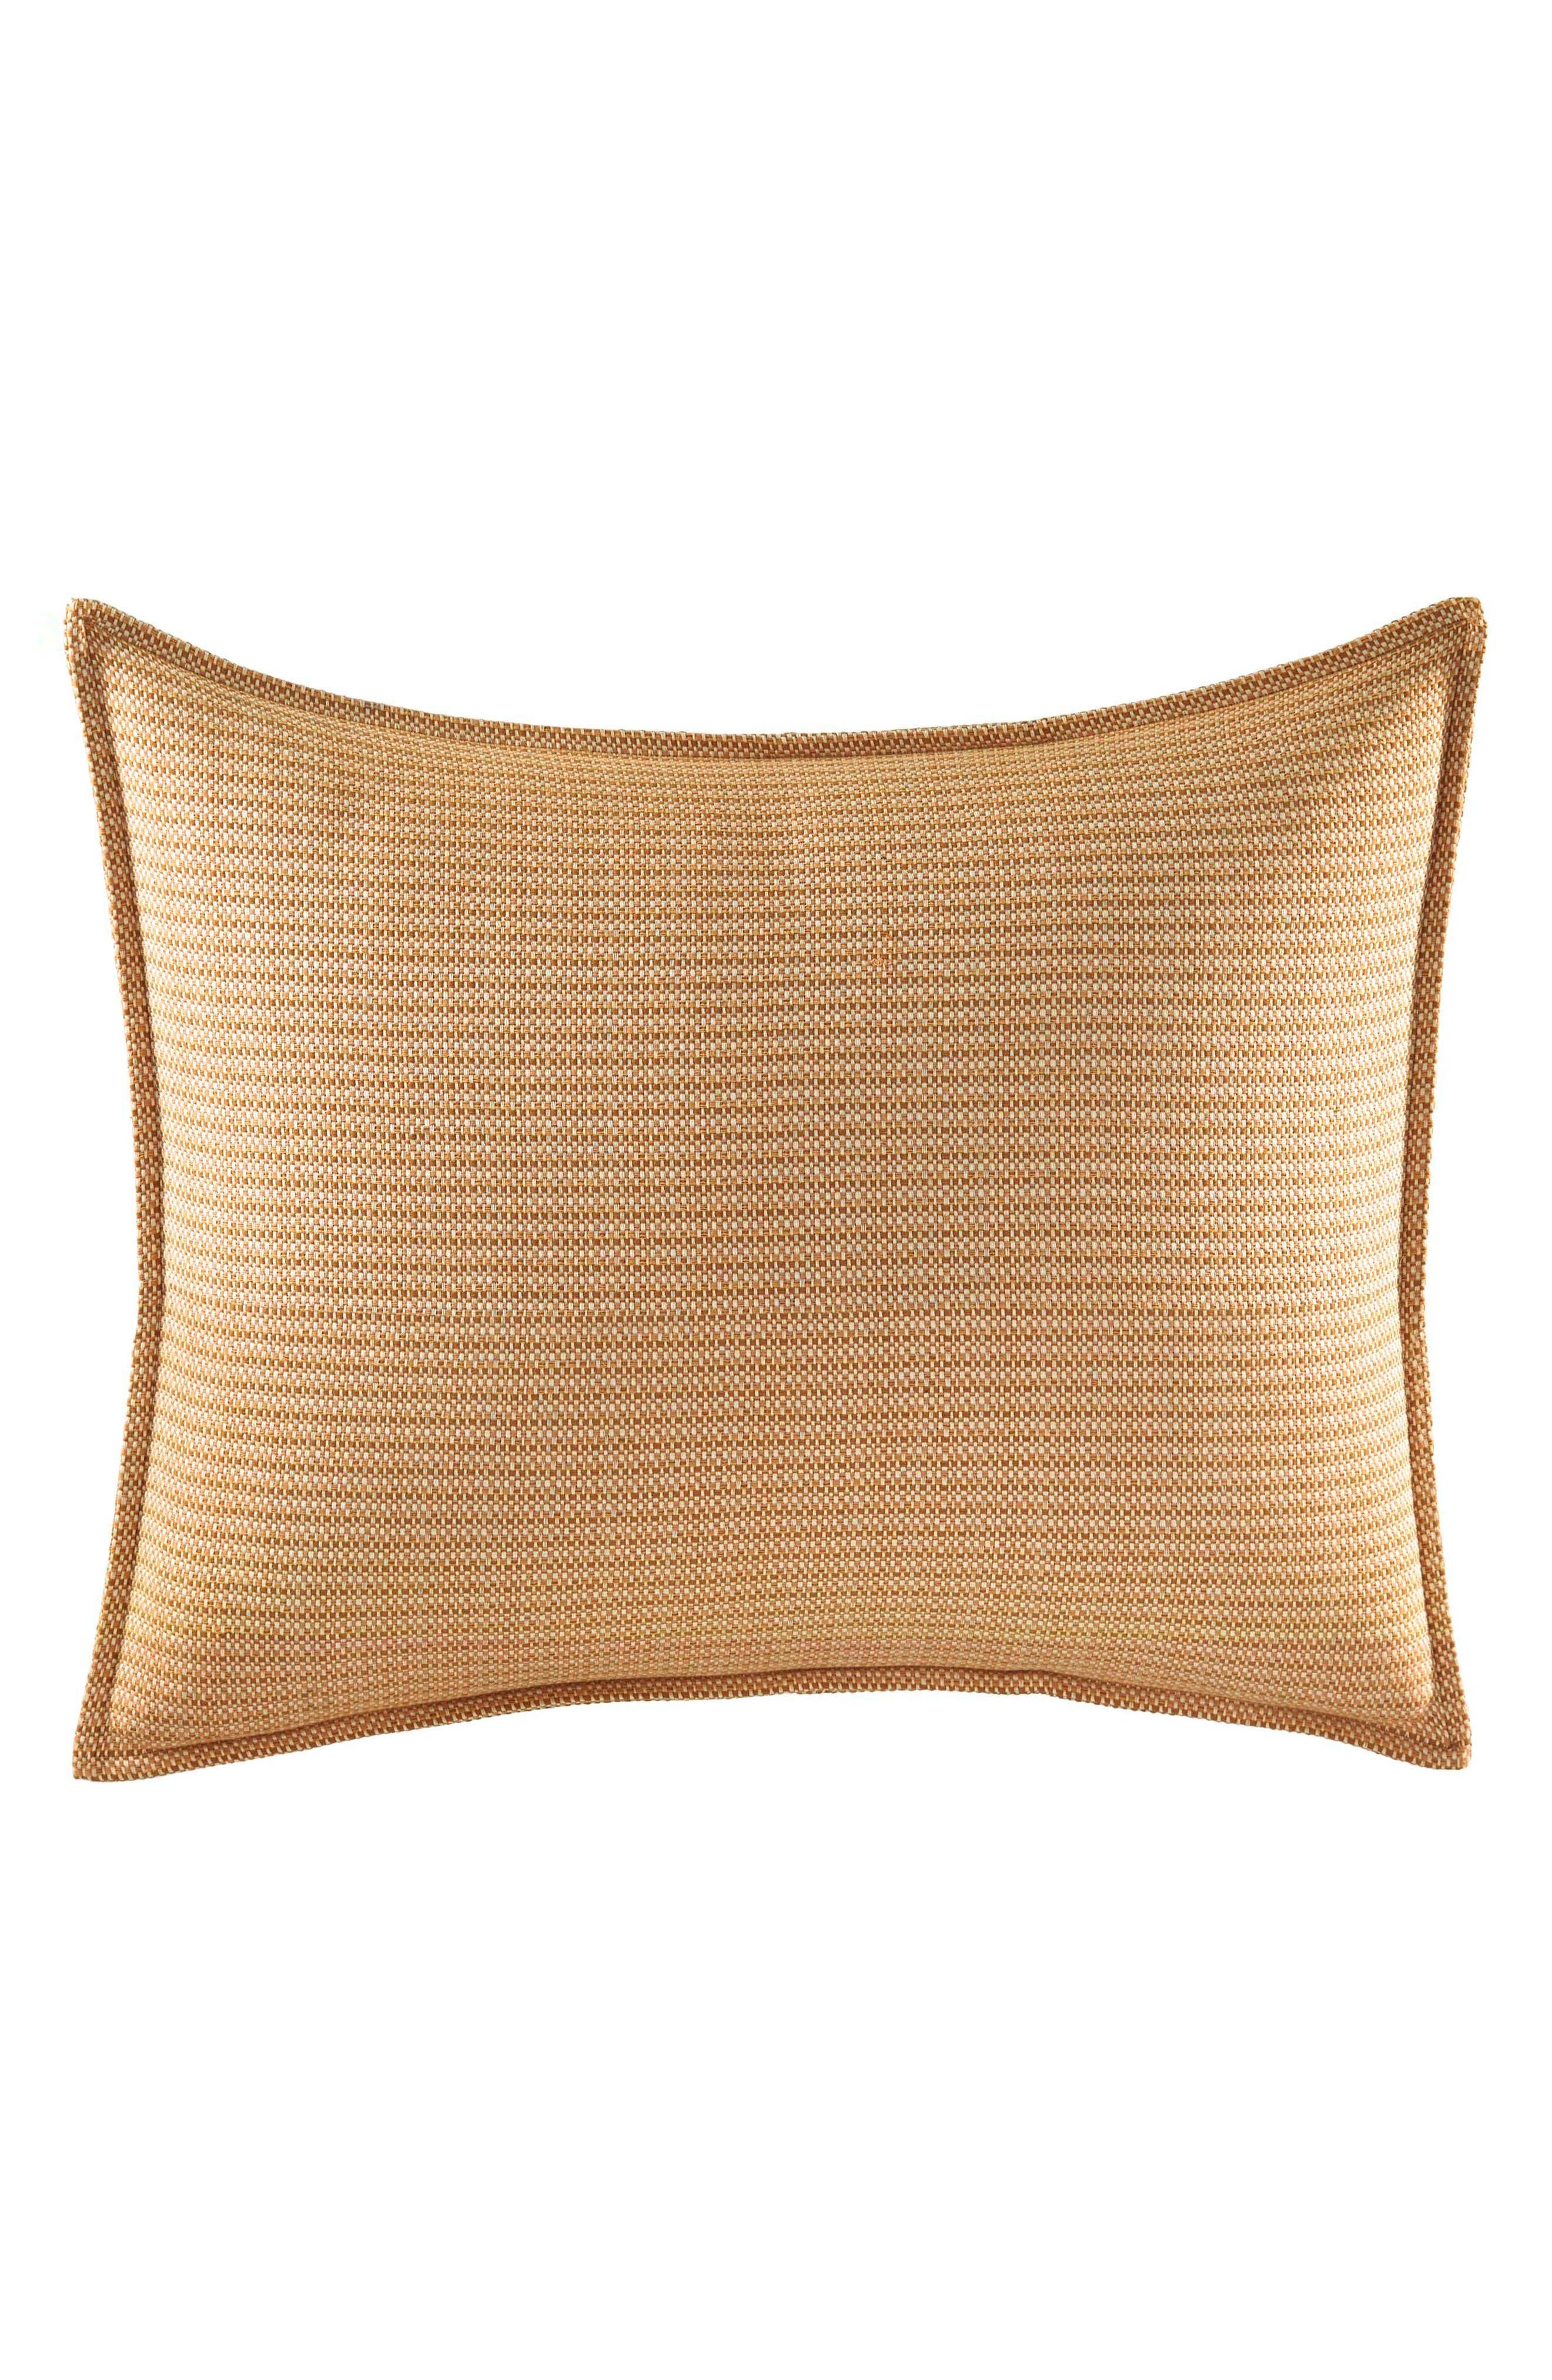 Cayo Coco Pillow,                         Main,                         color, 220